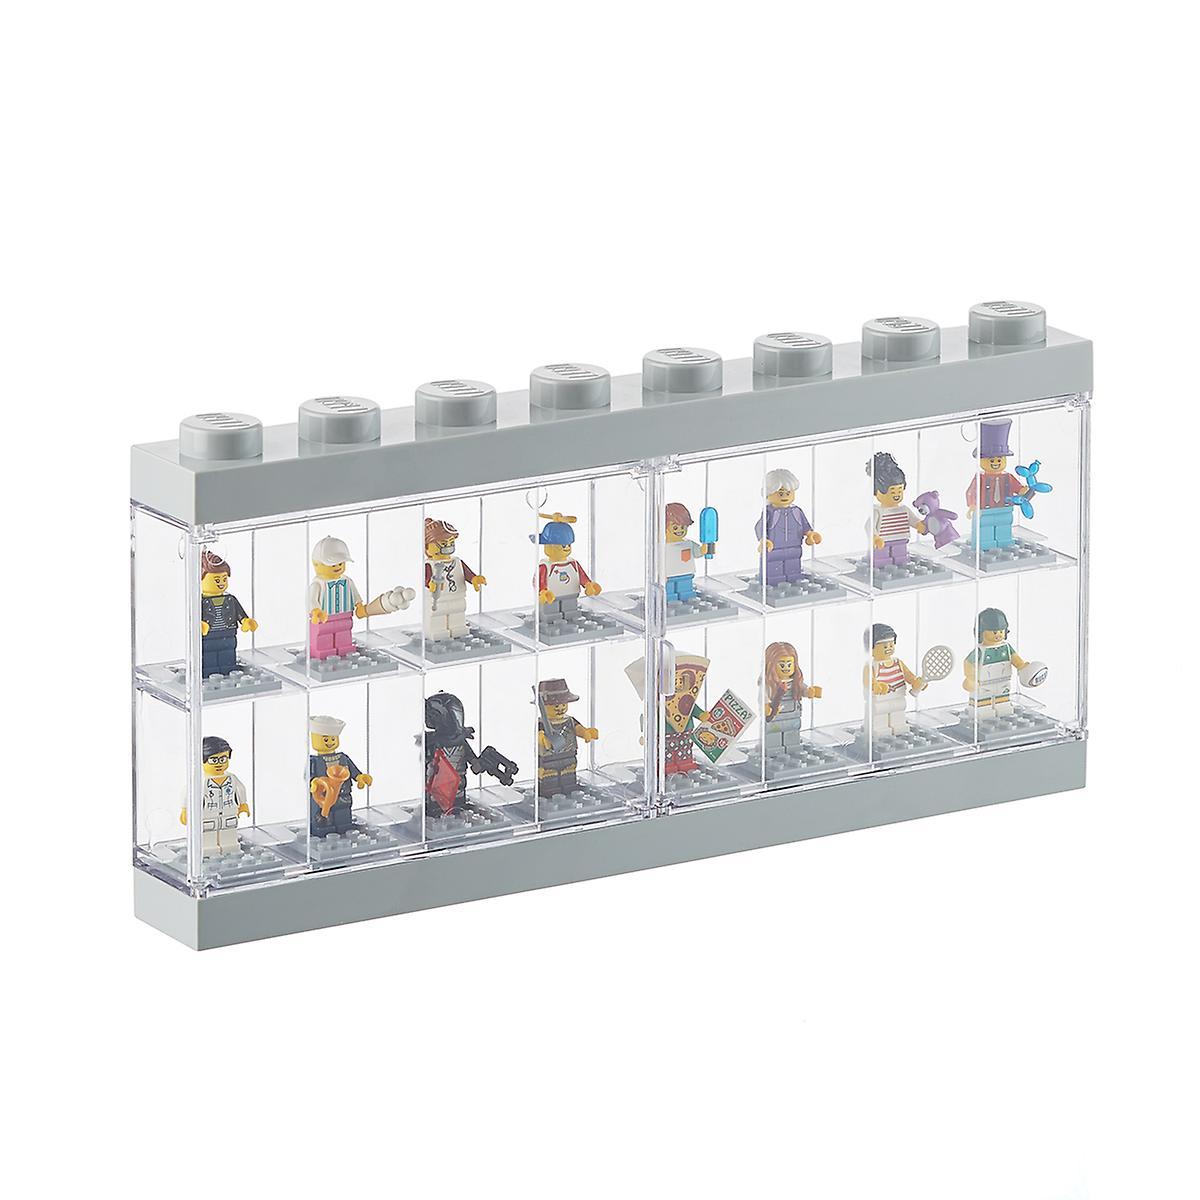 Lego Large Minifigure Display Case